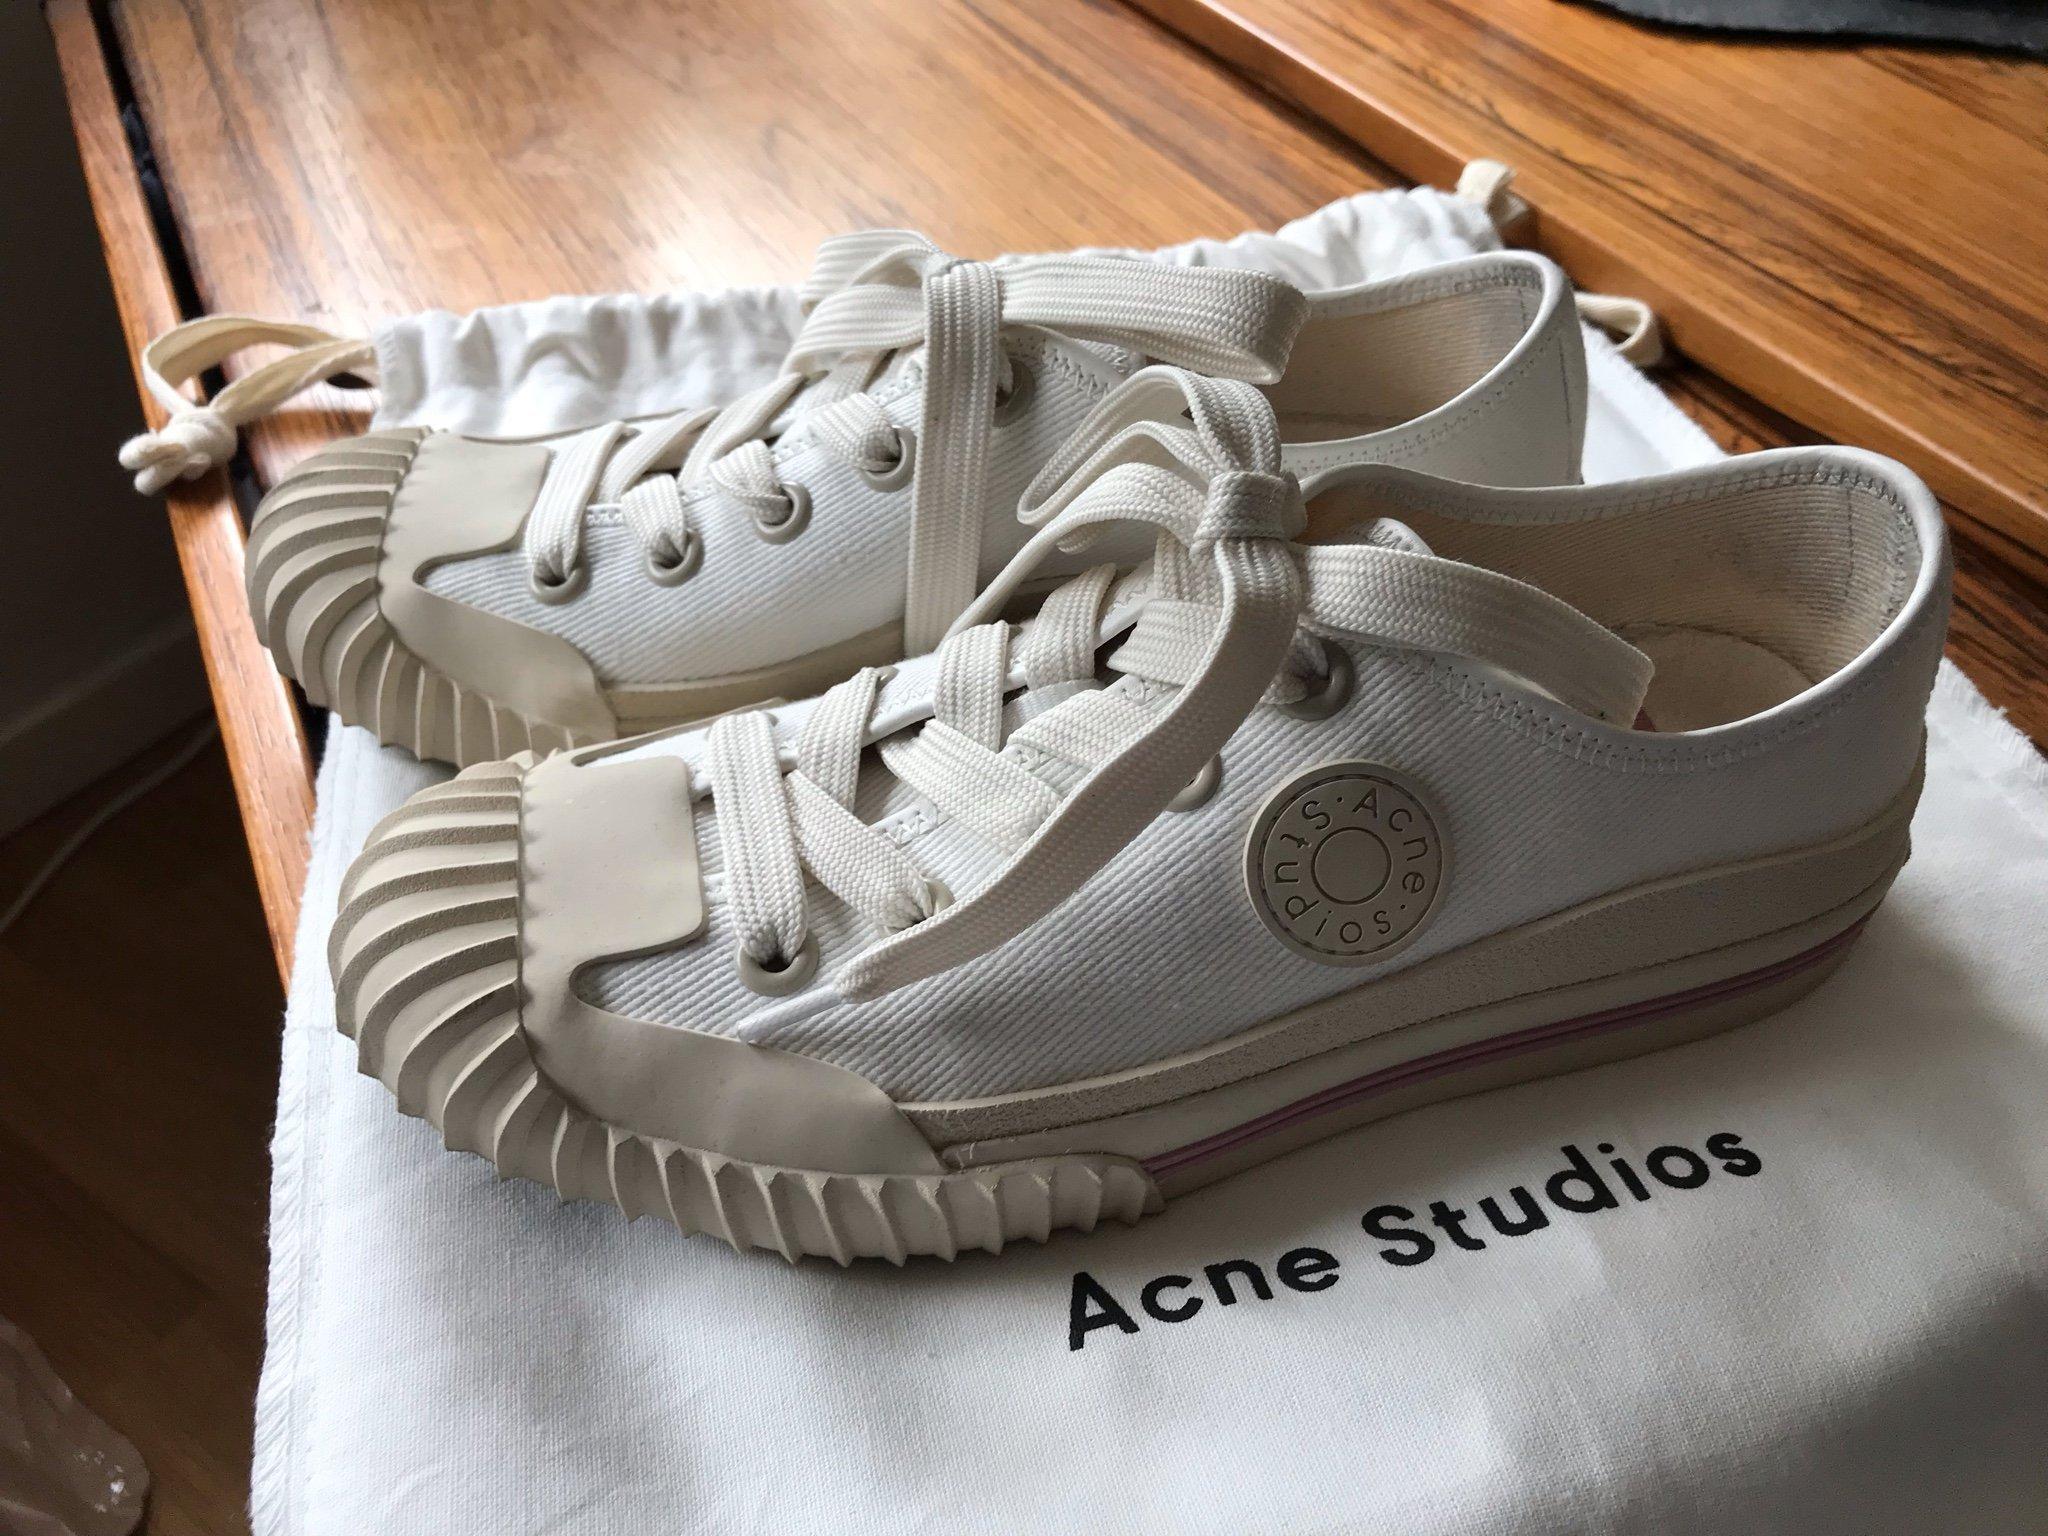 Acne Studios Low Top Sneakers